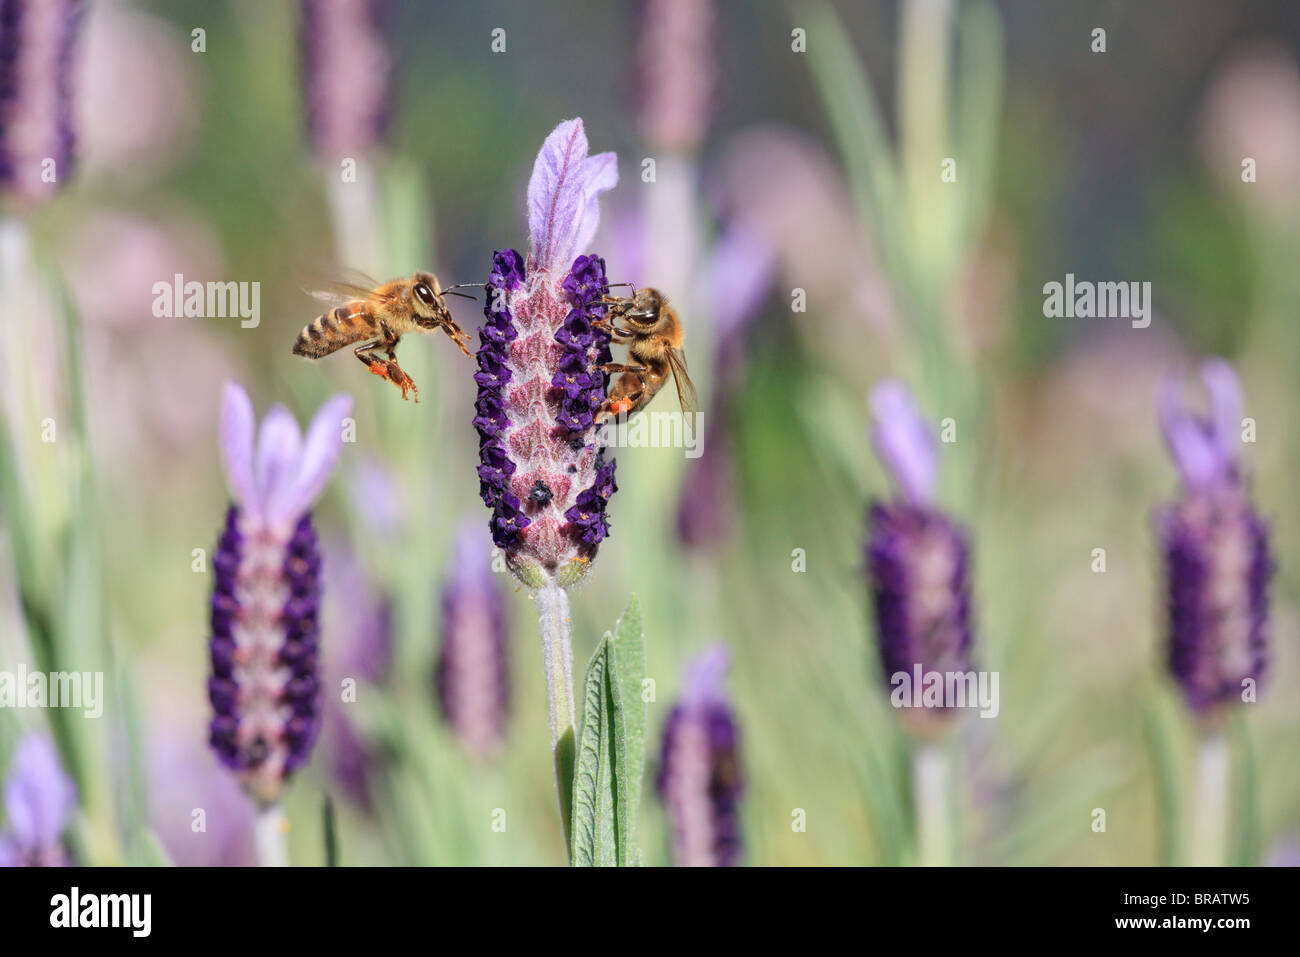 Honey bee. Two honey bees ( Apis mellifera ) on a French lavender flower ( Lavandula stoechas ). - Stock Image